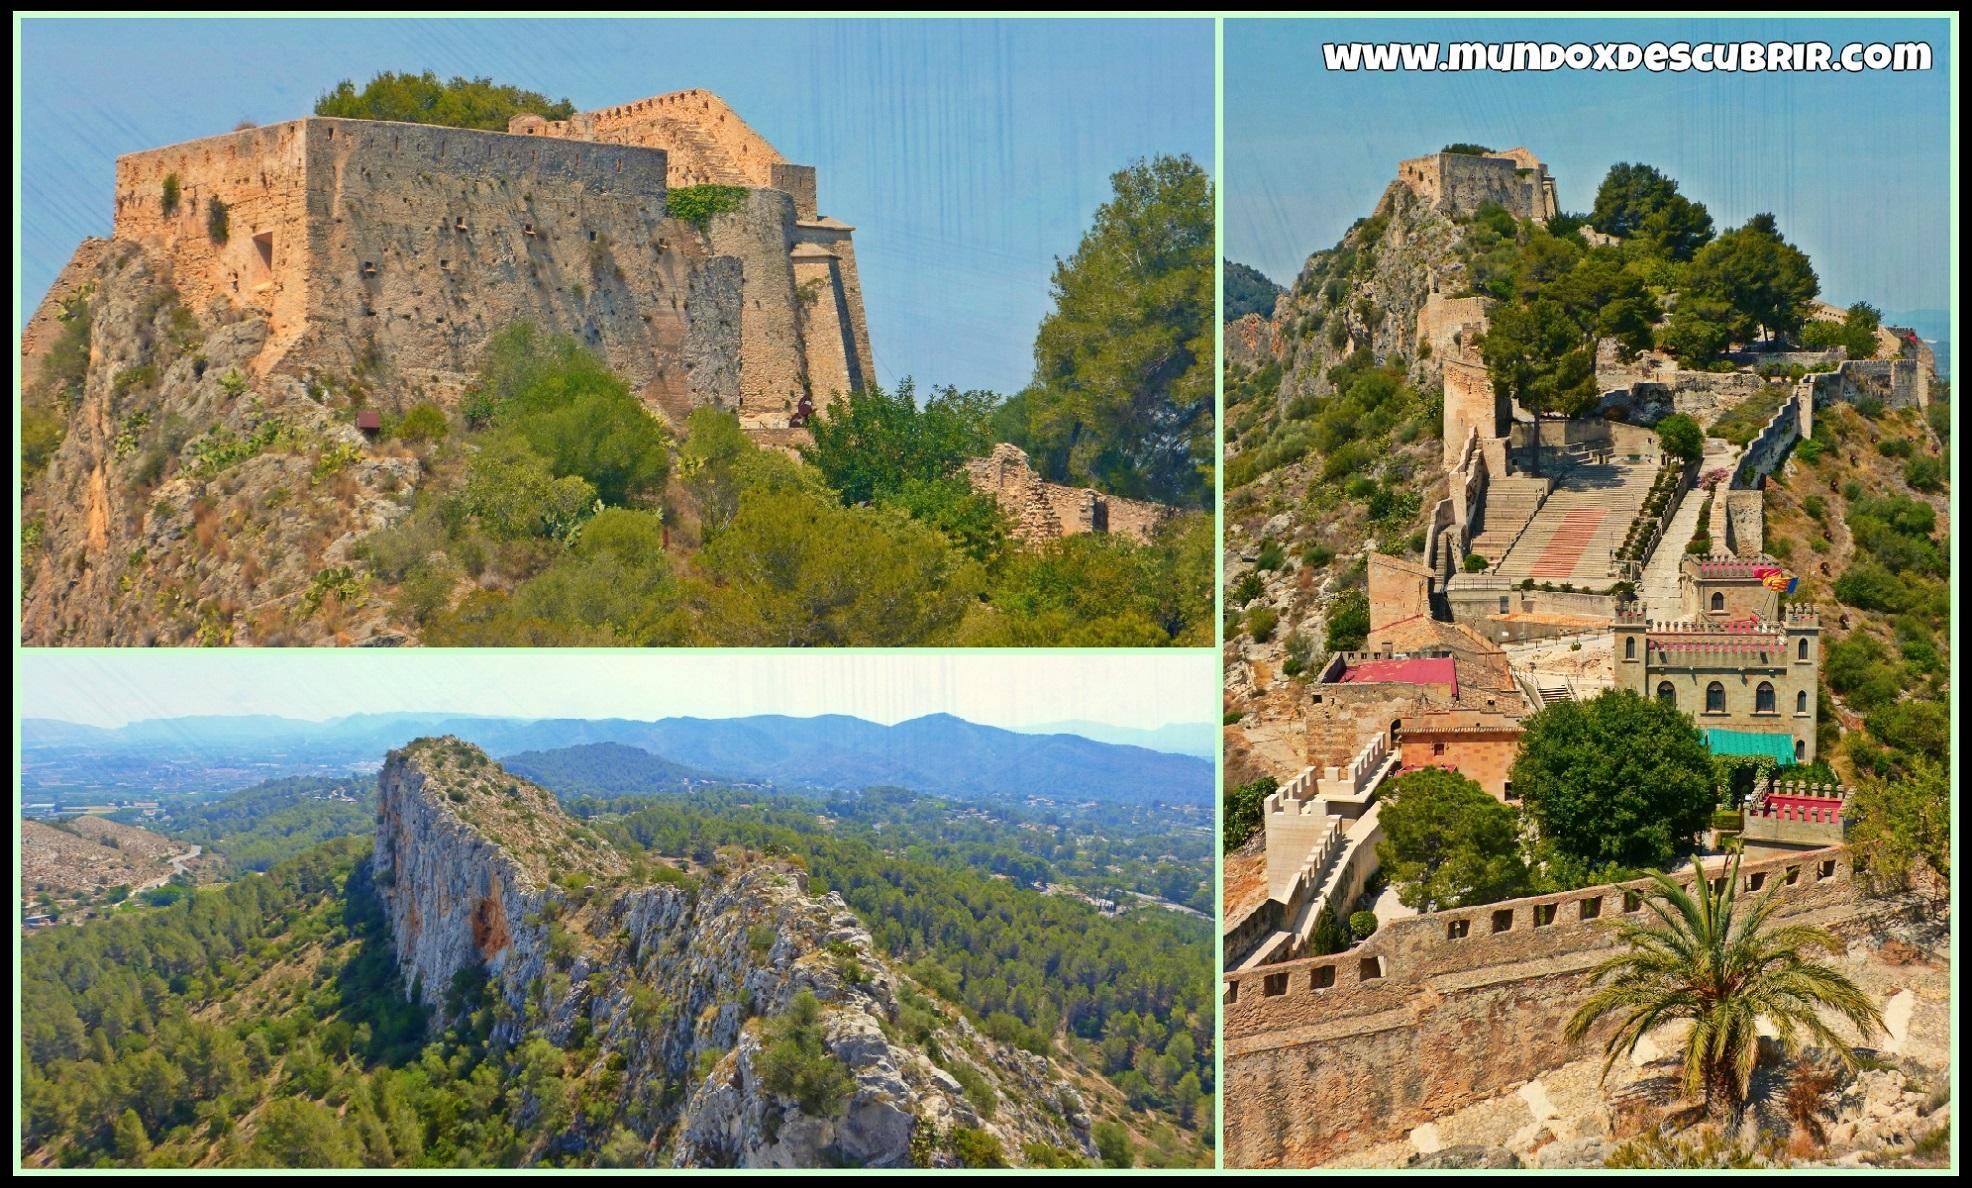 Castillo de Xtiva Doble Fortaleza de origen Ibrico